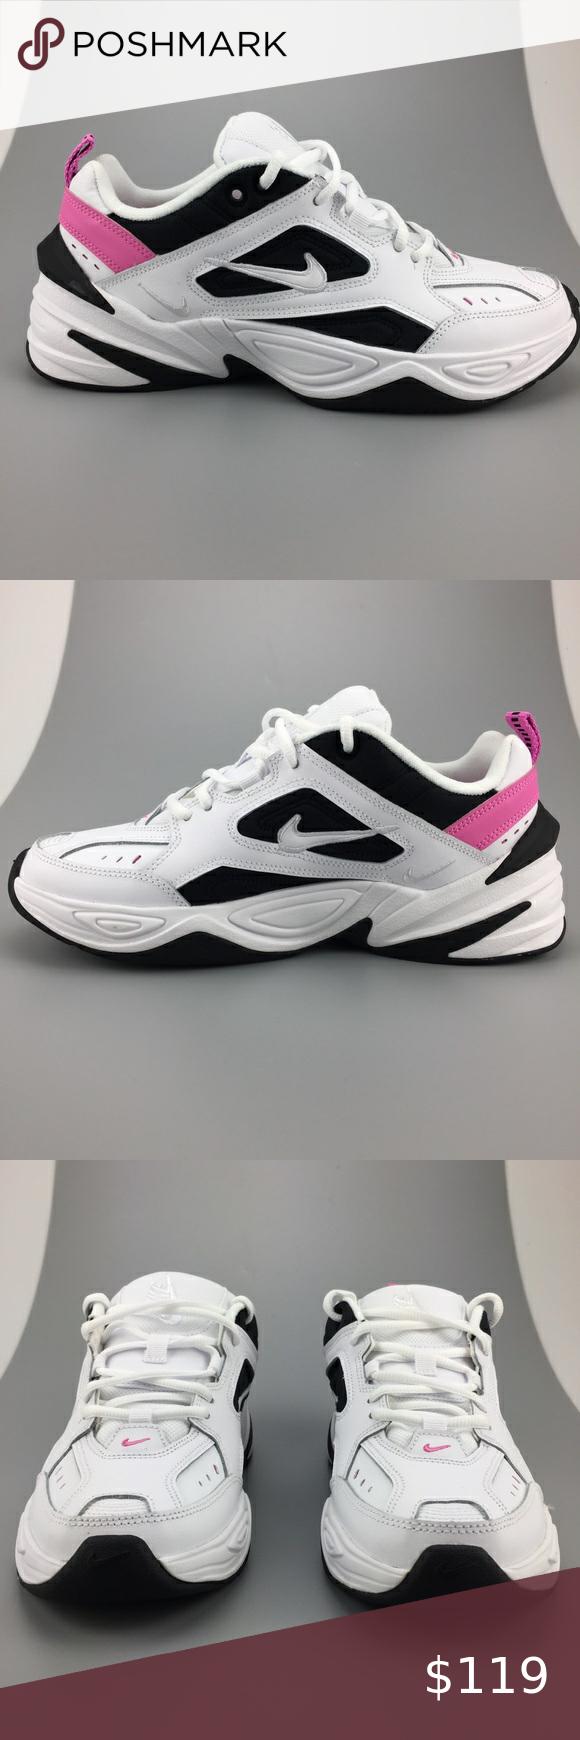 Tomar un riesgo Rechazar bufanda  Nike M2K Tekno White China Rose Black Sneakers | Pink nike shoes, White nike  shoes, Black sneakers